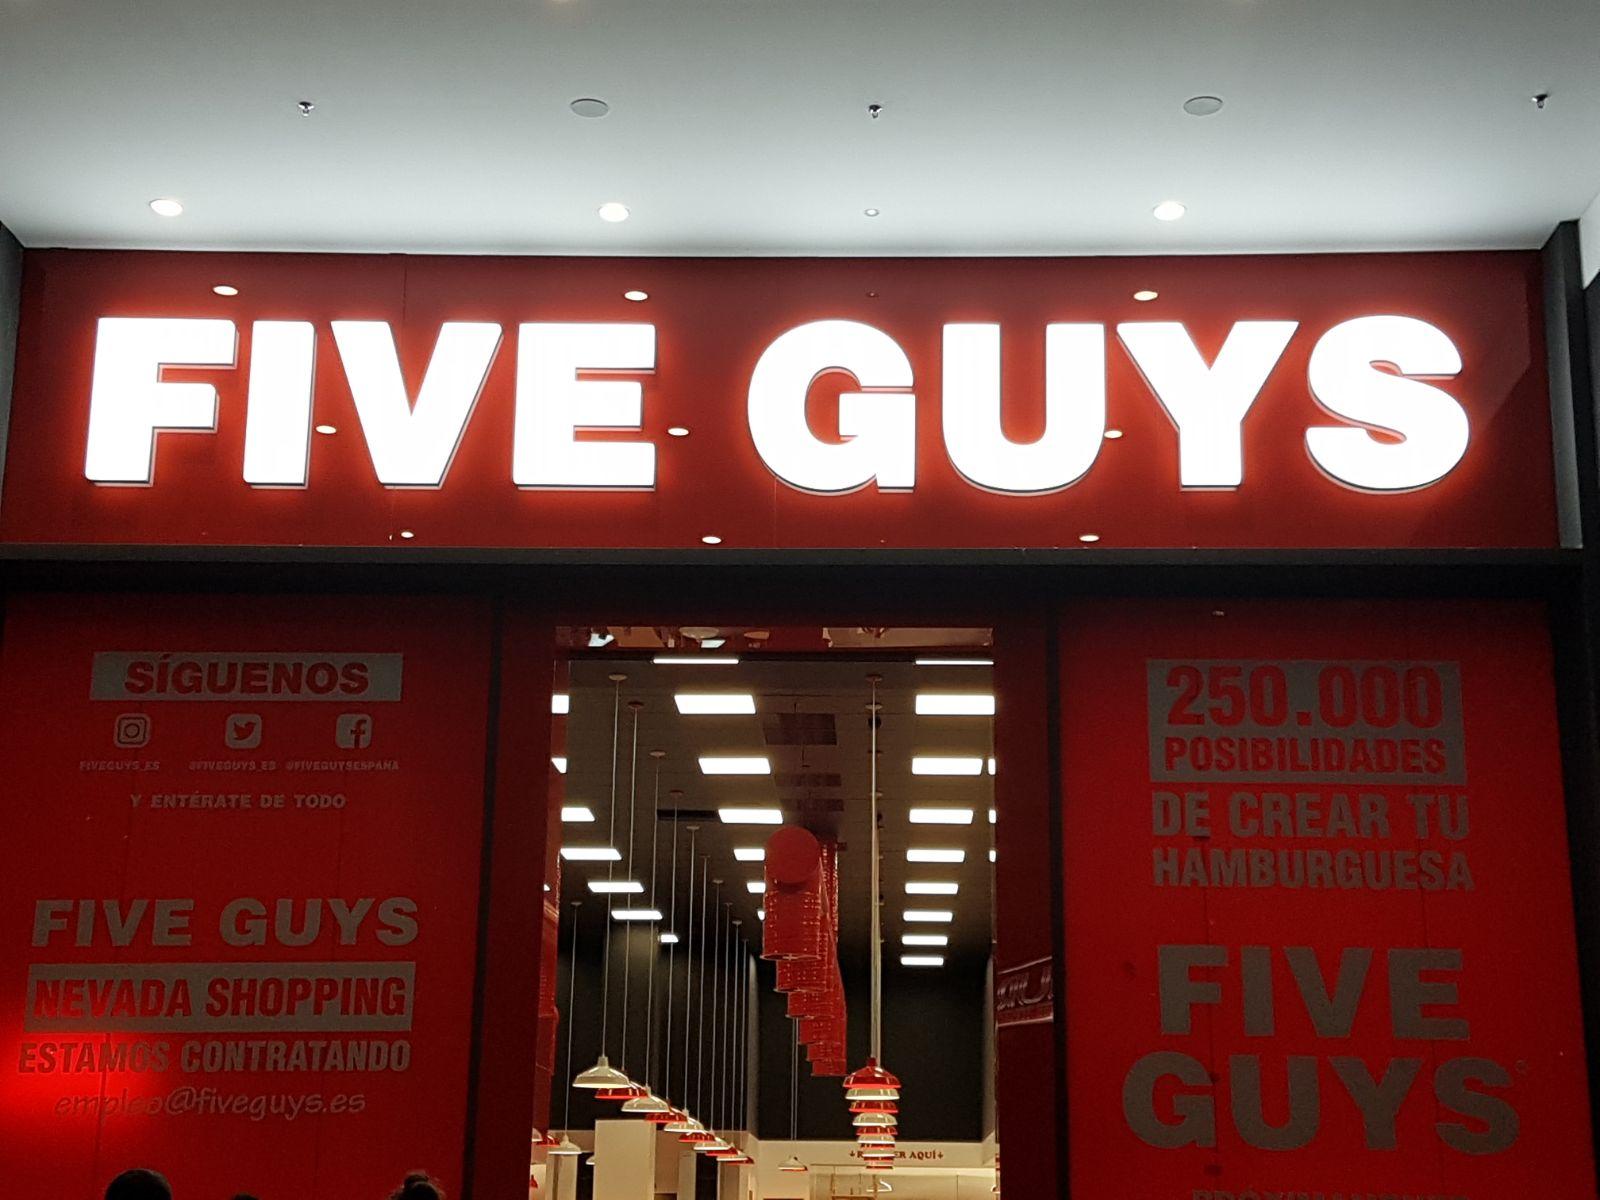 FIVE GUYS - Illuminated Sign 2